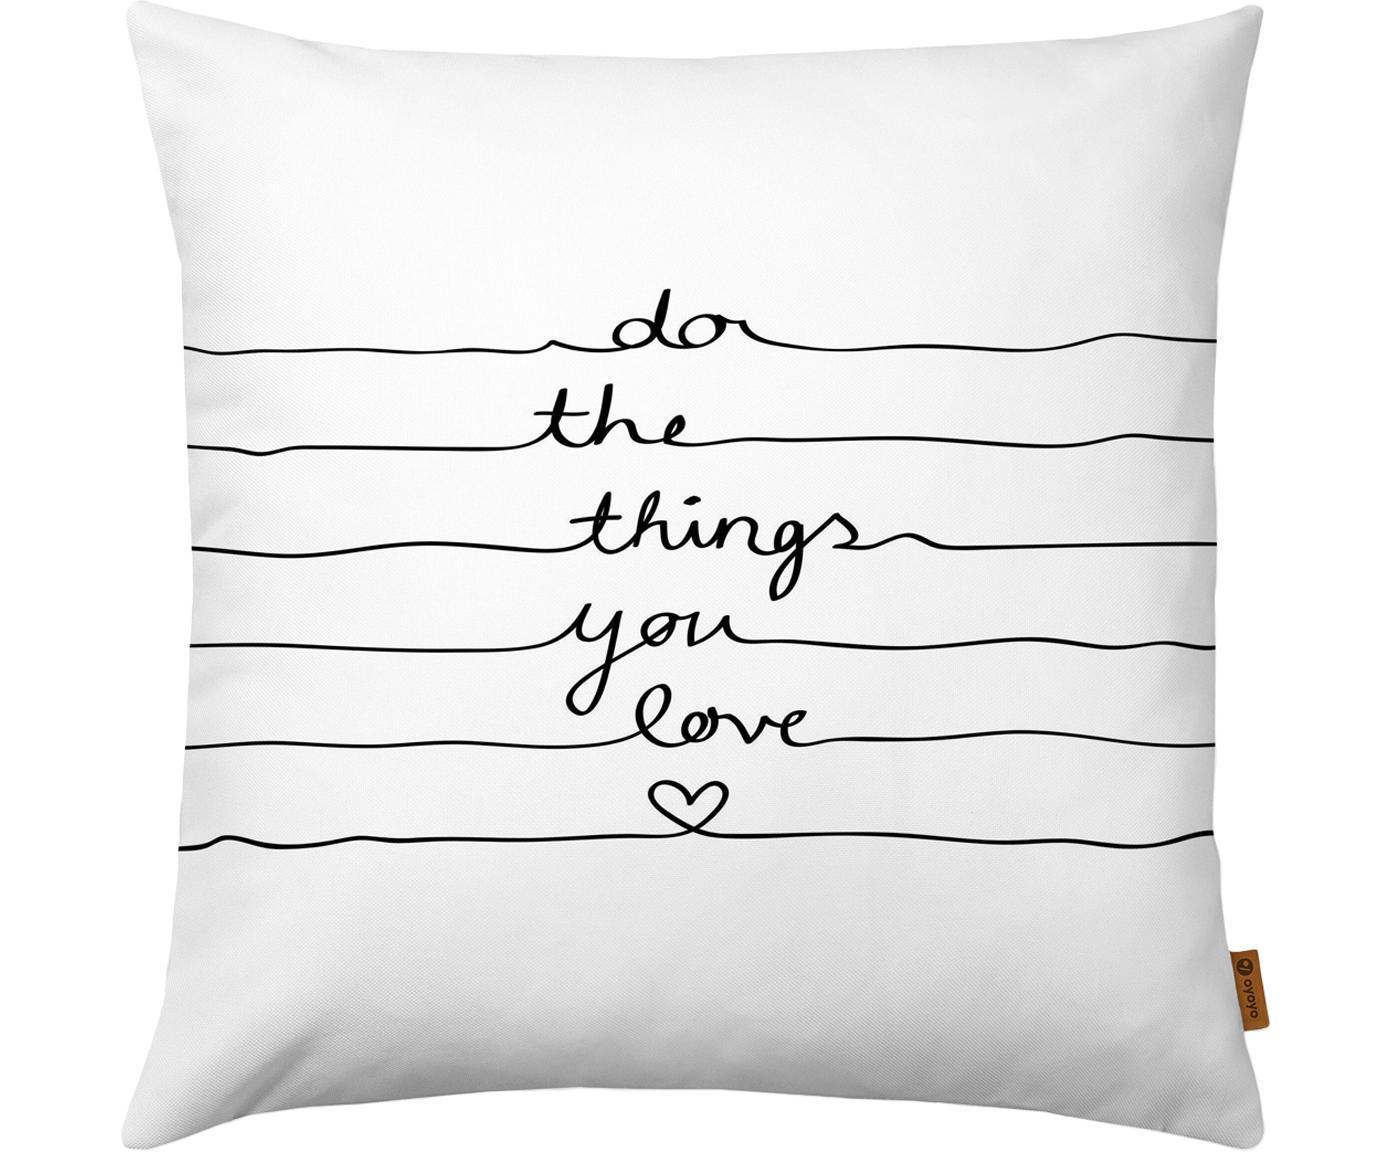 Kissenhülle Do The Things You Love mit Schriftzug, Polyester, Weiß, Schwarz, 50 x 50 cm